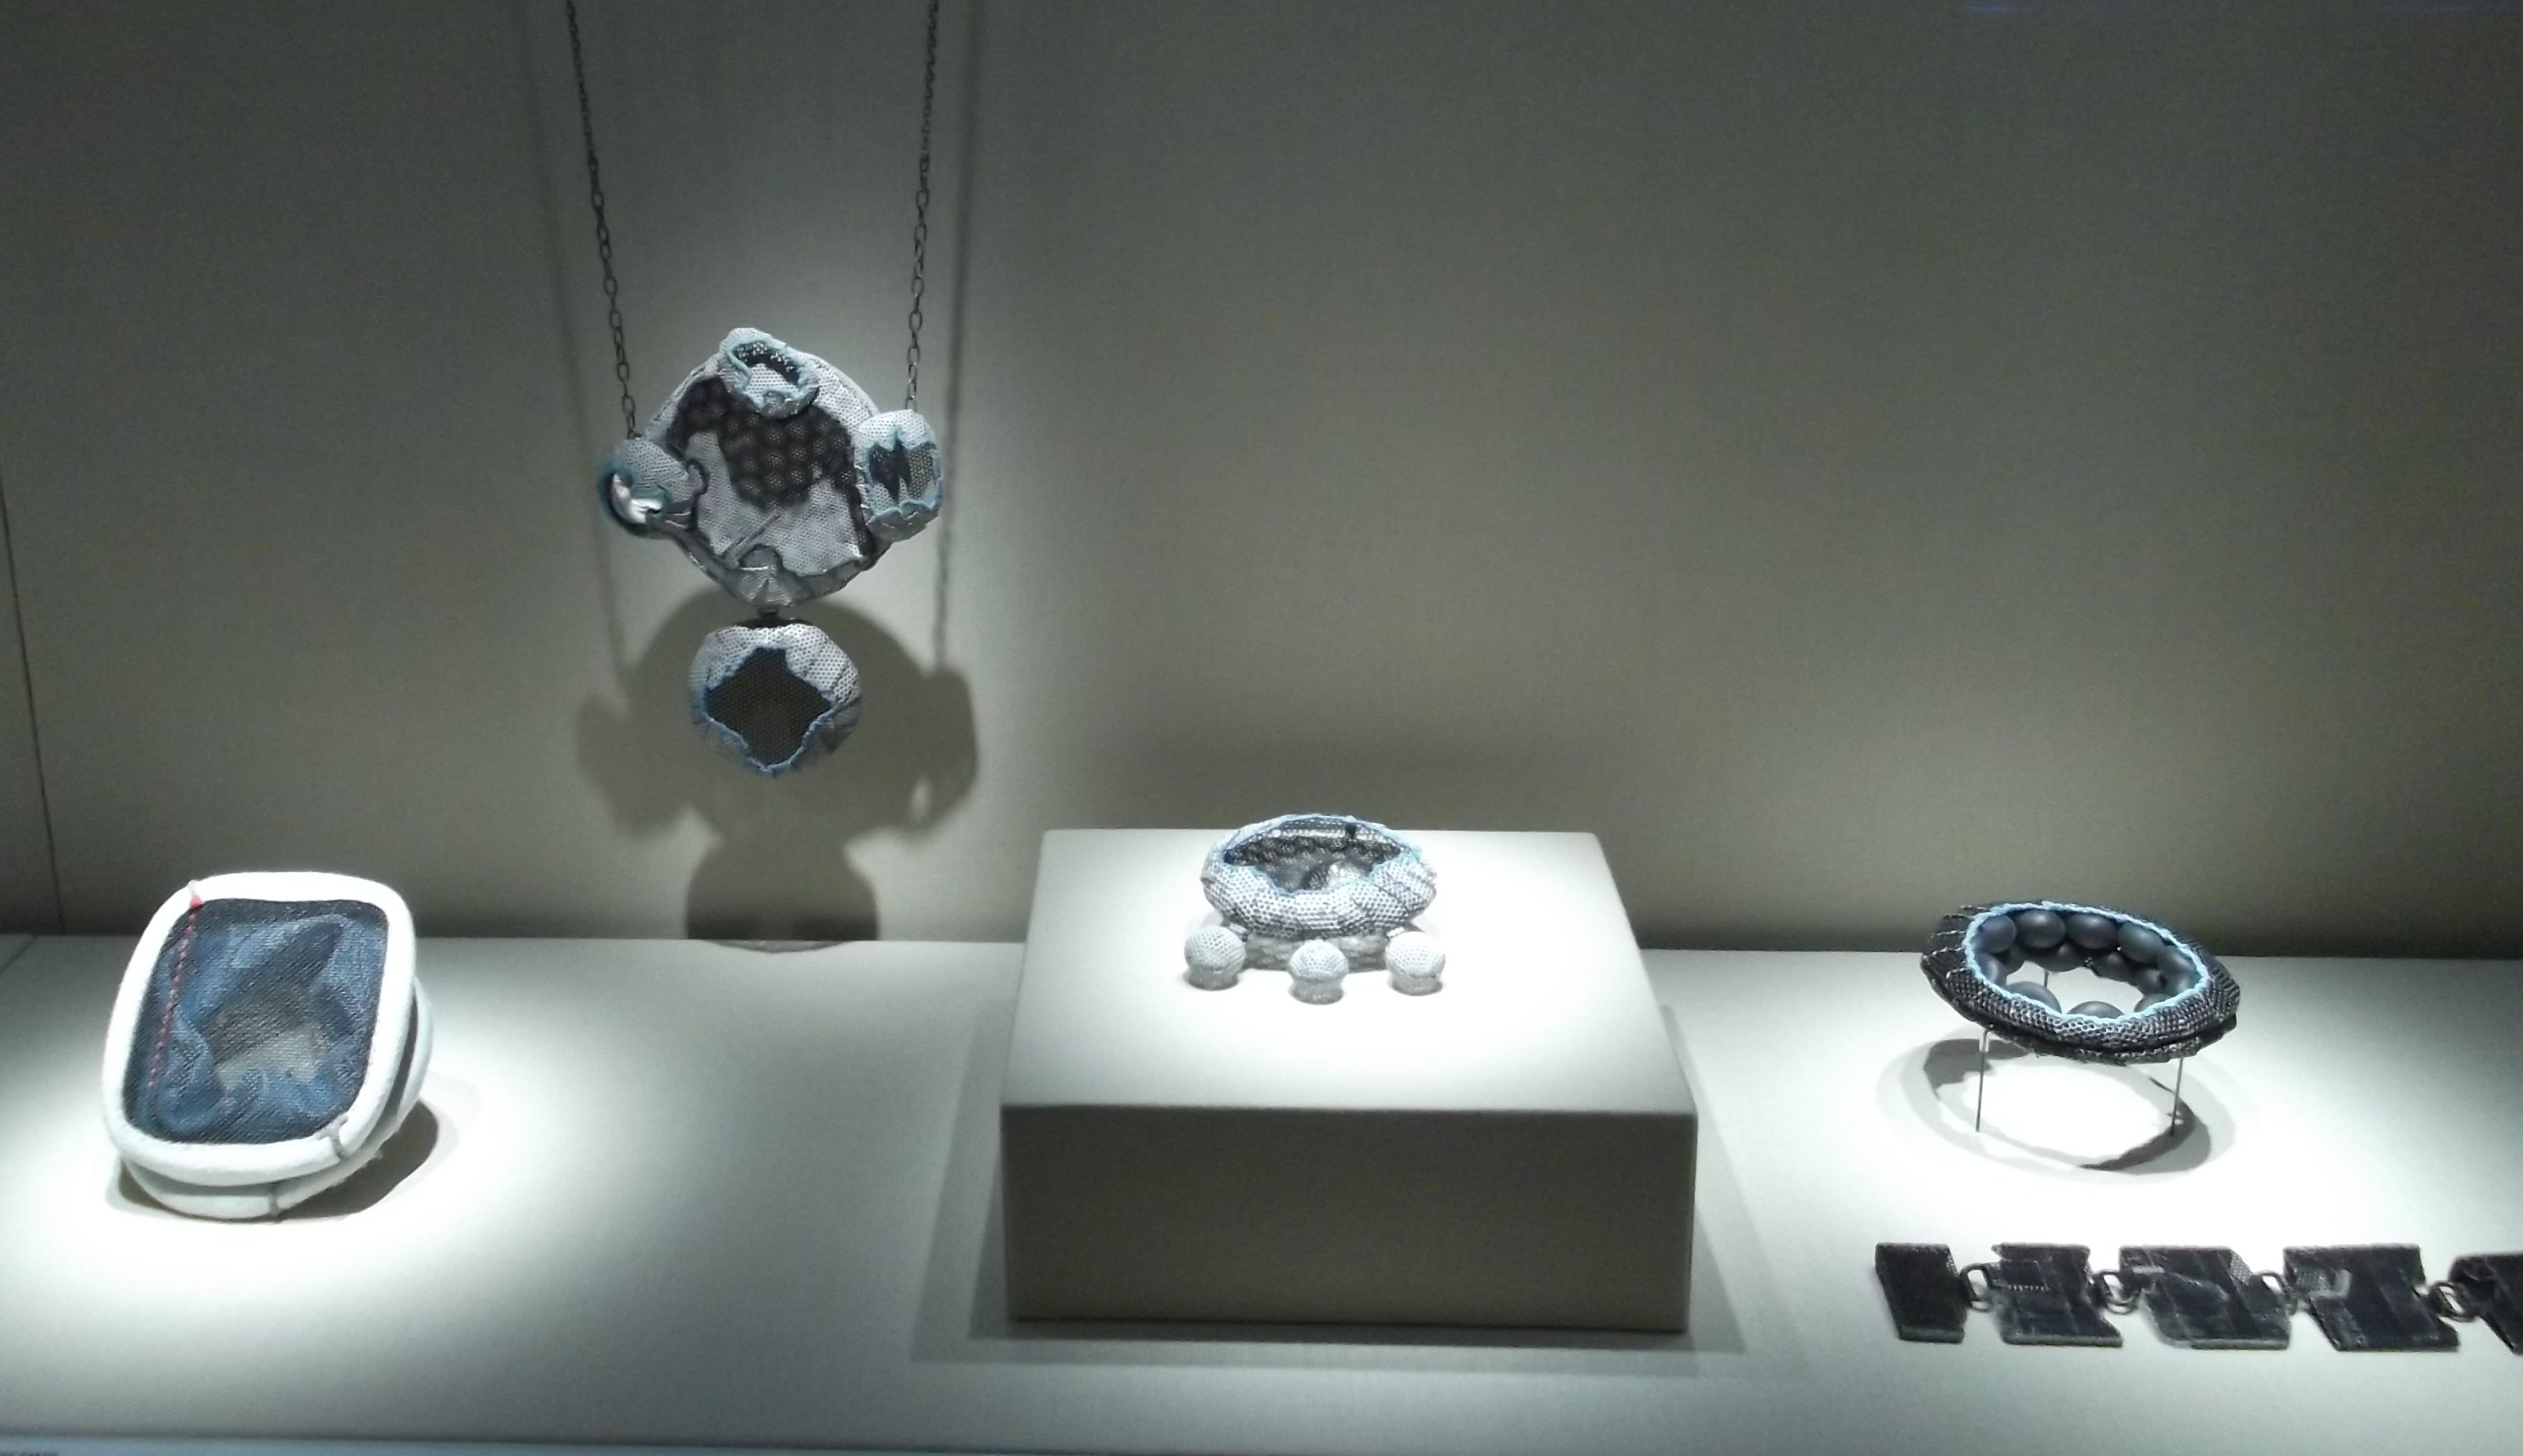 Dana Hakim. Transit, Schmuckmuseum Pforzheim, 2012. Foto Jürgen Eickhoff, sieraden, tentoonstelling, ijzer, katoen, verf, lak